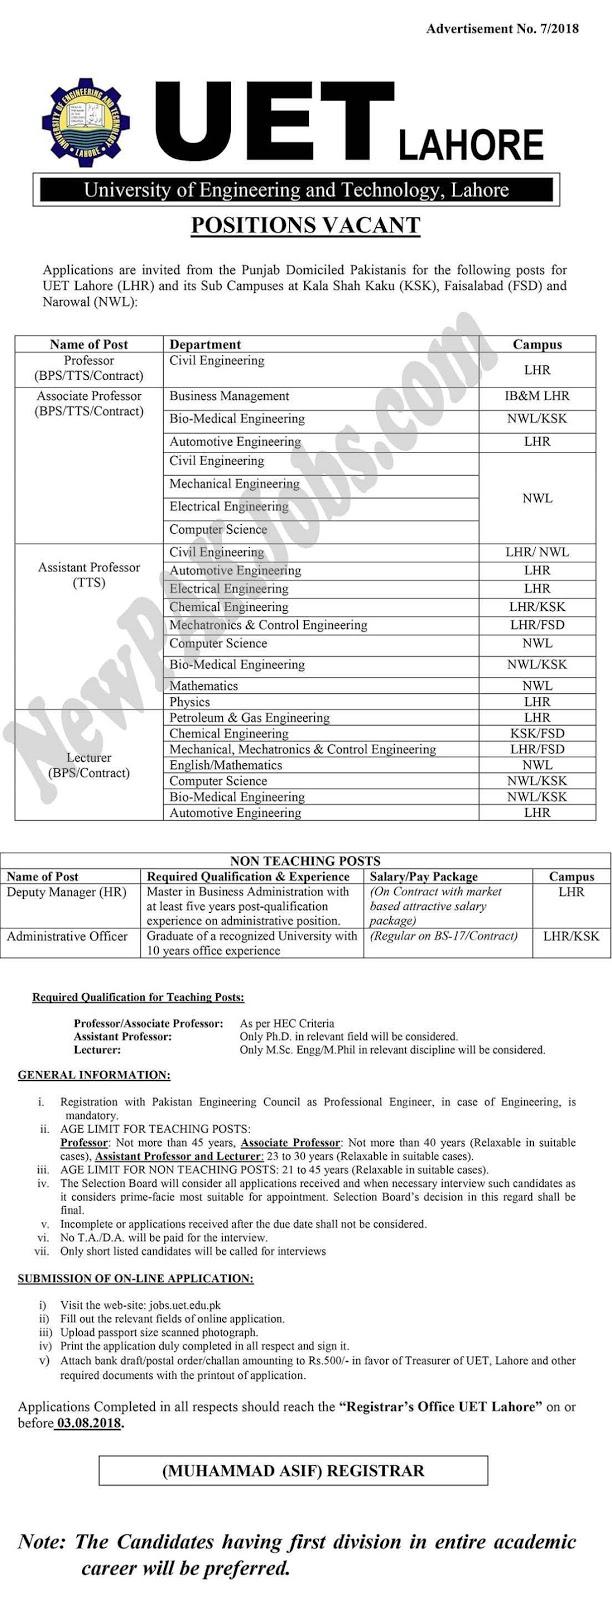 UET Lahore Latest Govt Jobs July 2018 | www.uet.edu.pk